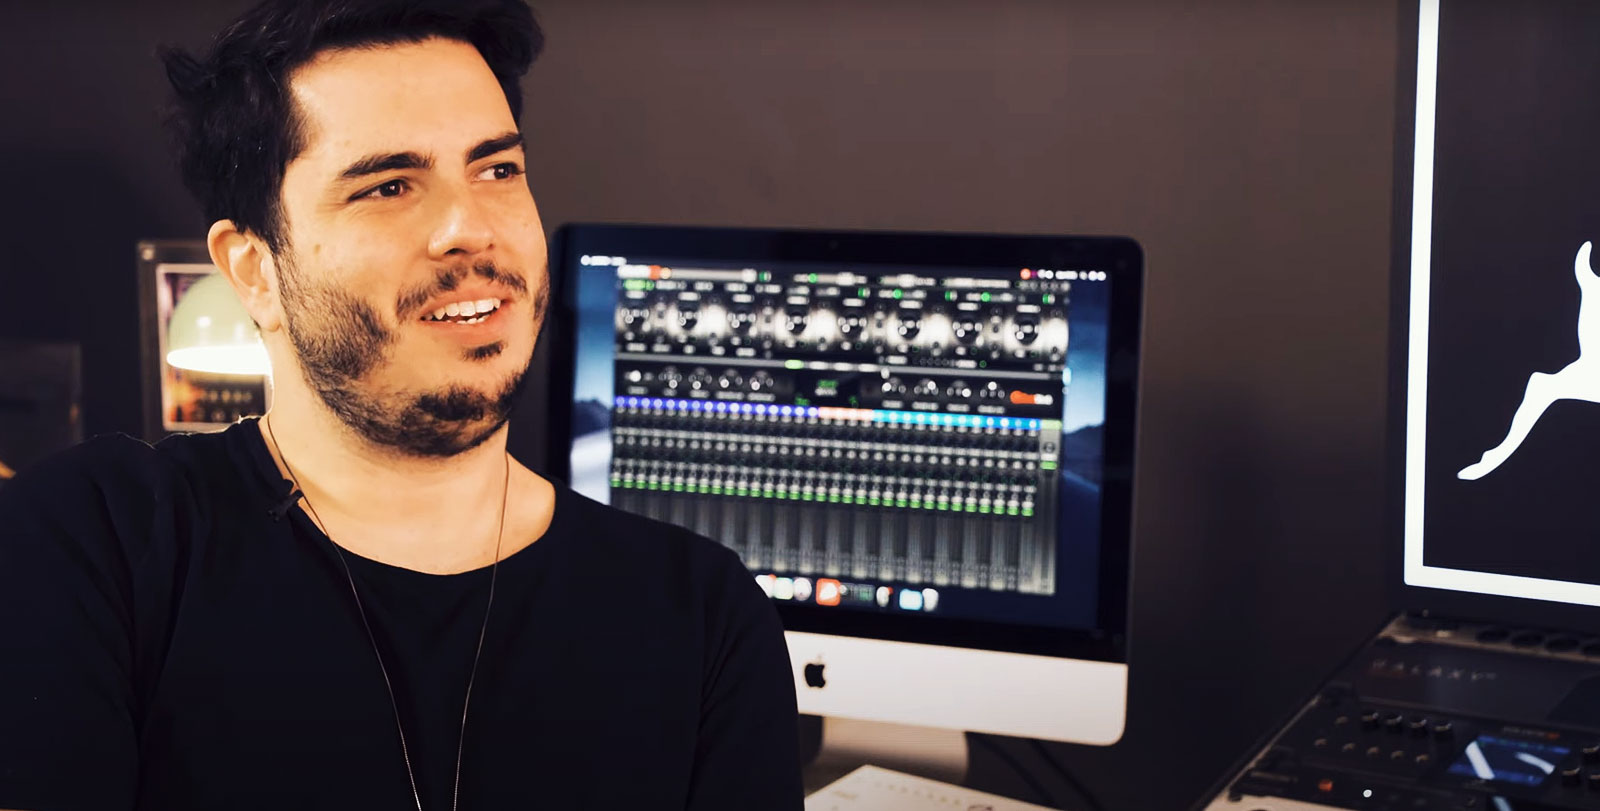 Wehbba Talks DJing, Production Process & How Goliath HD | Gen 3 Fits In